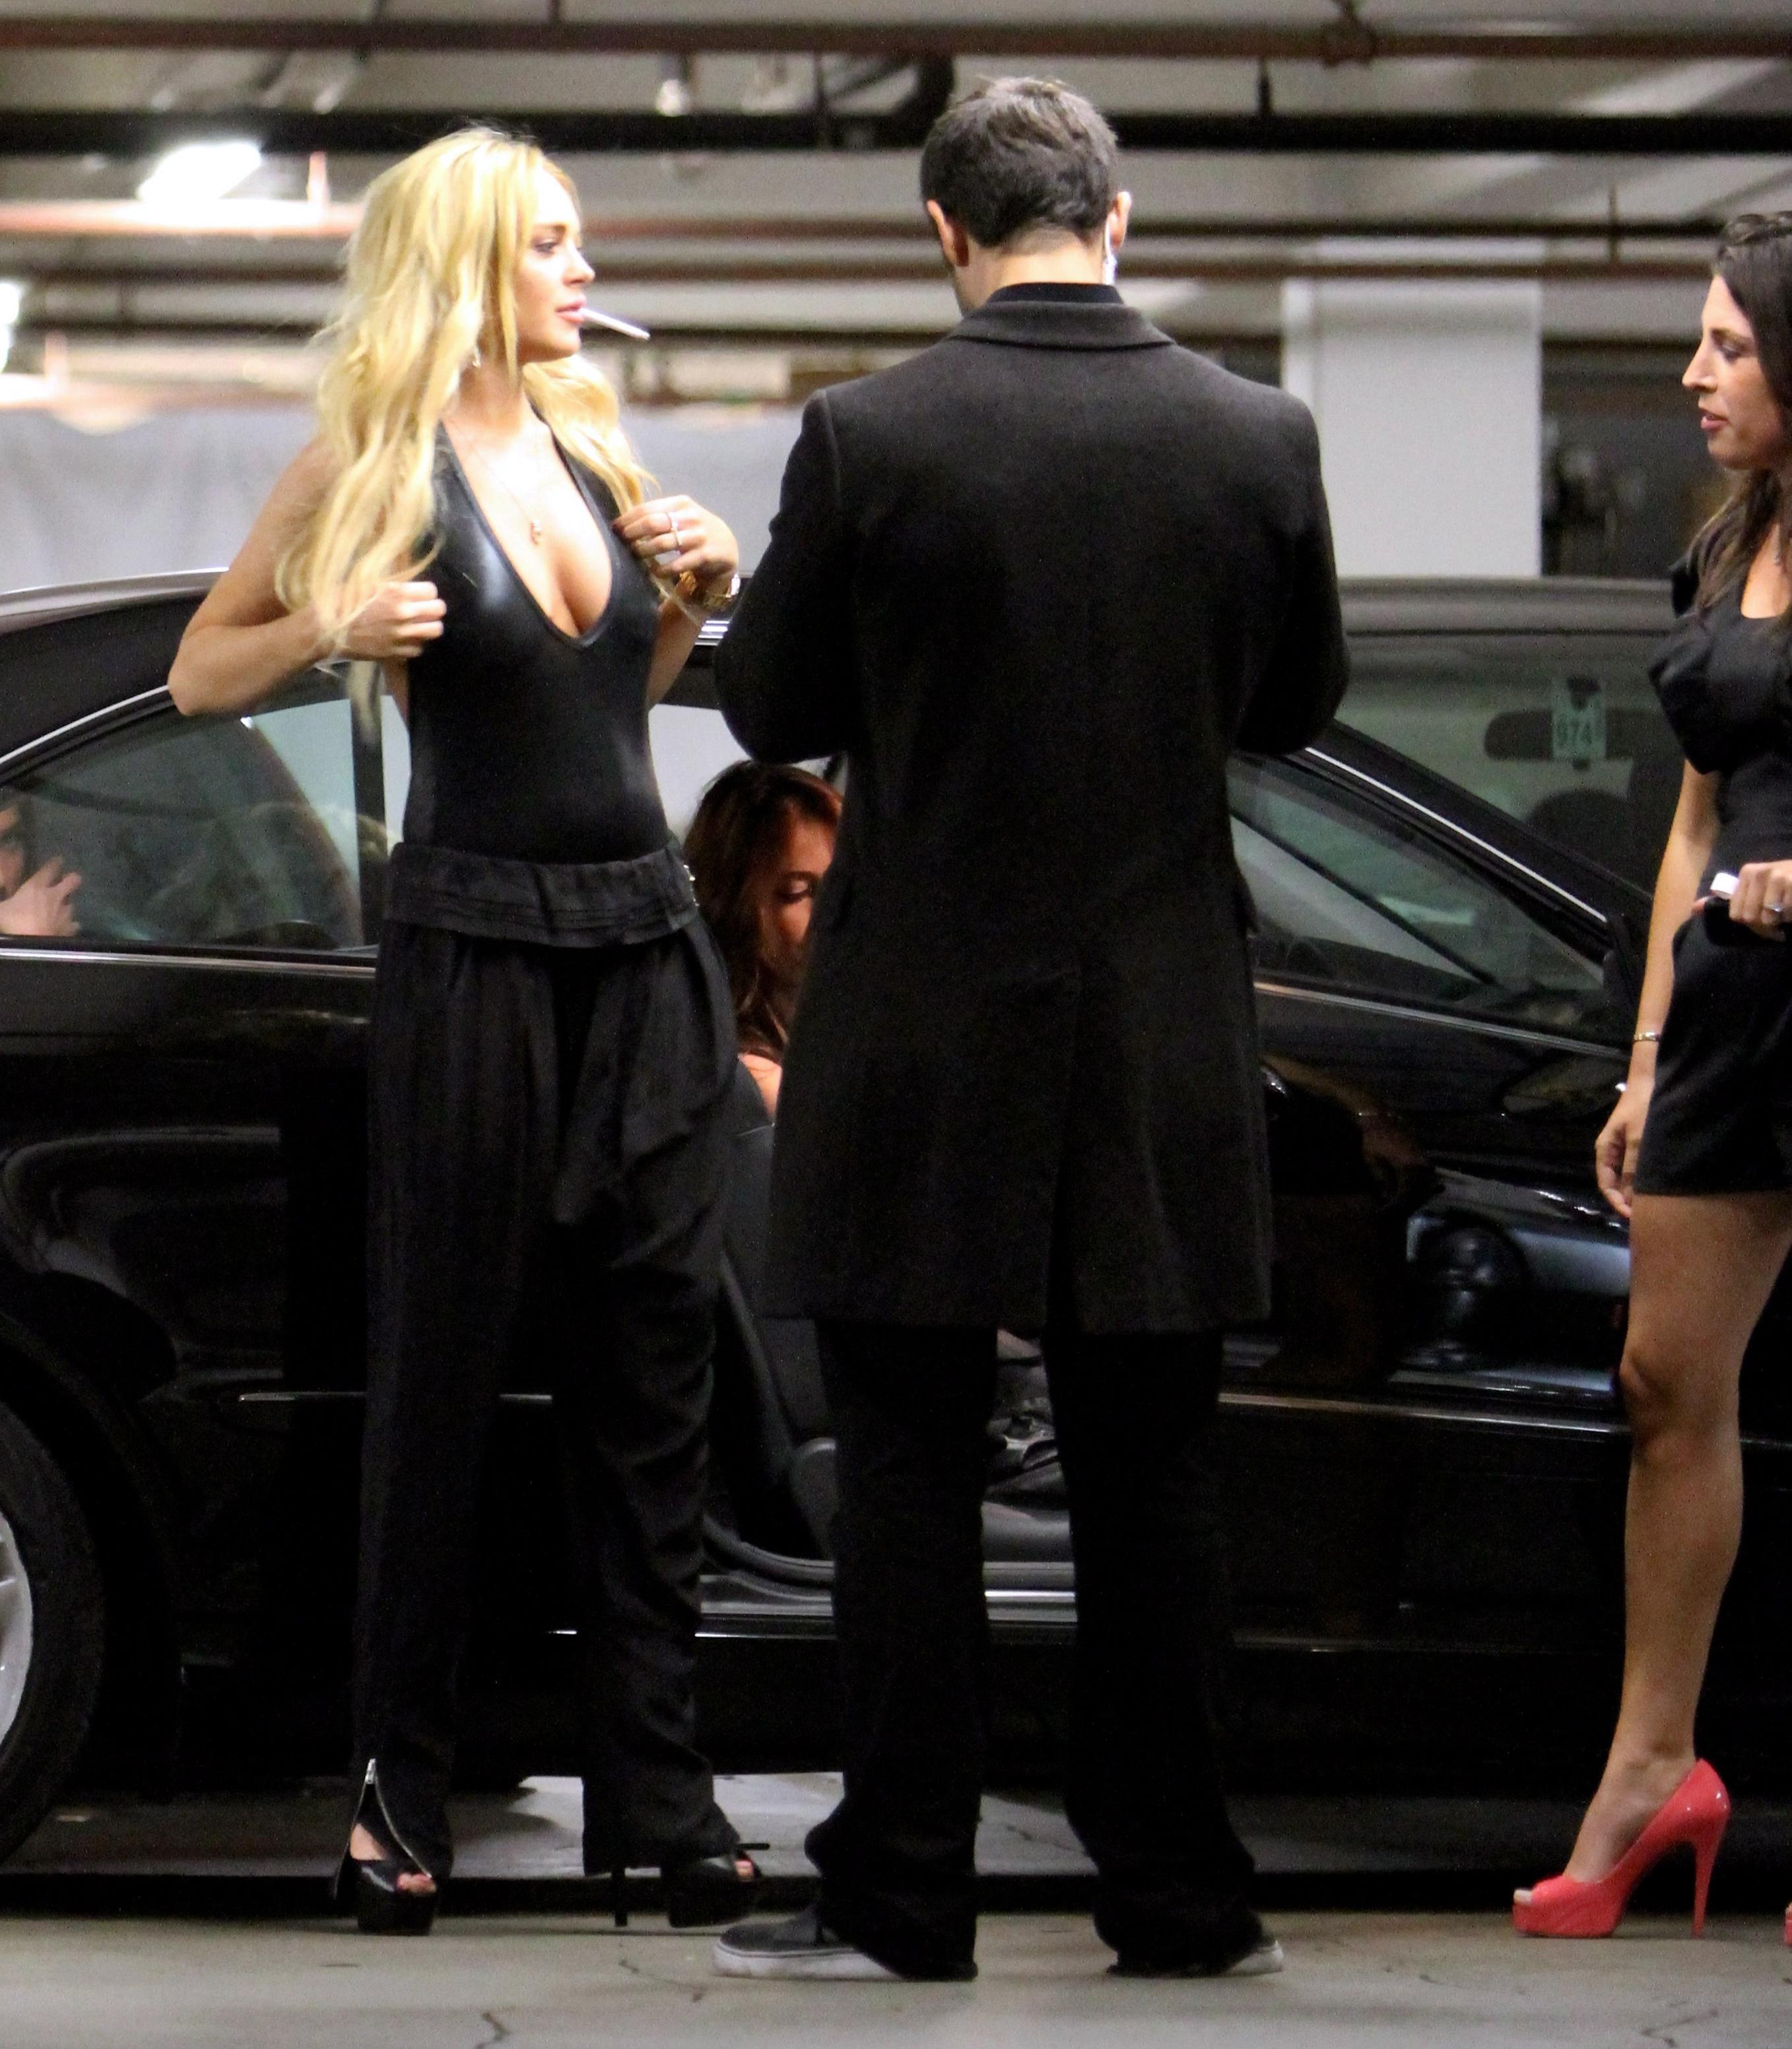 84365_CFF_Lindsay_Lohan_in_the_parking_garage_of_The_Mondrian_hotel_16_122_402lo.jpg